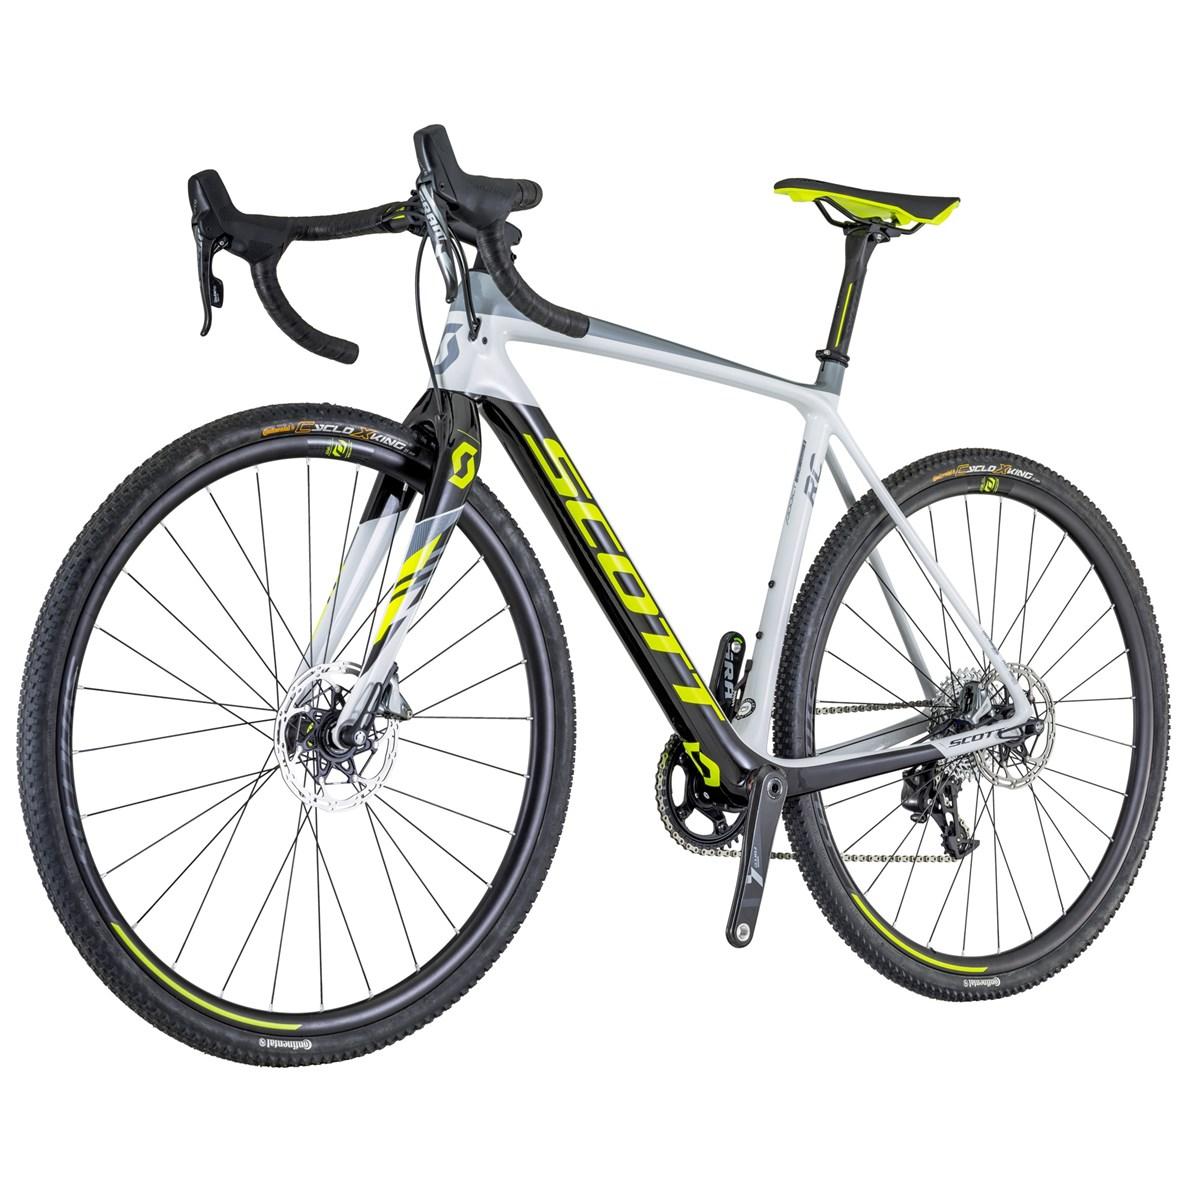 2018 Scott Addict CX RC Disc Carbon Bike £2,100 00